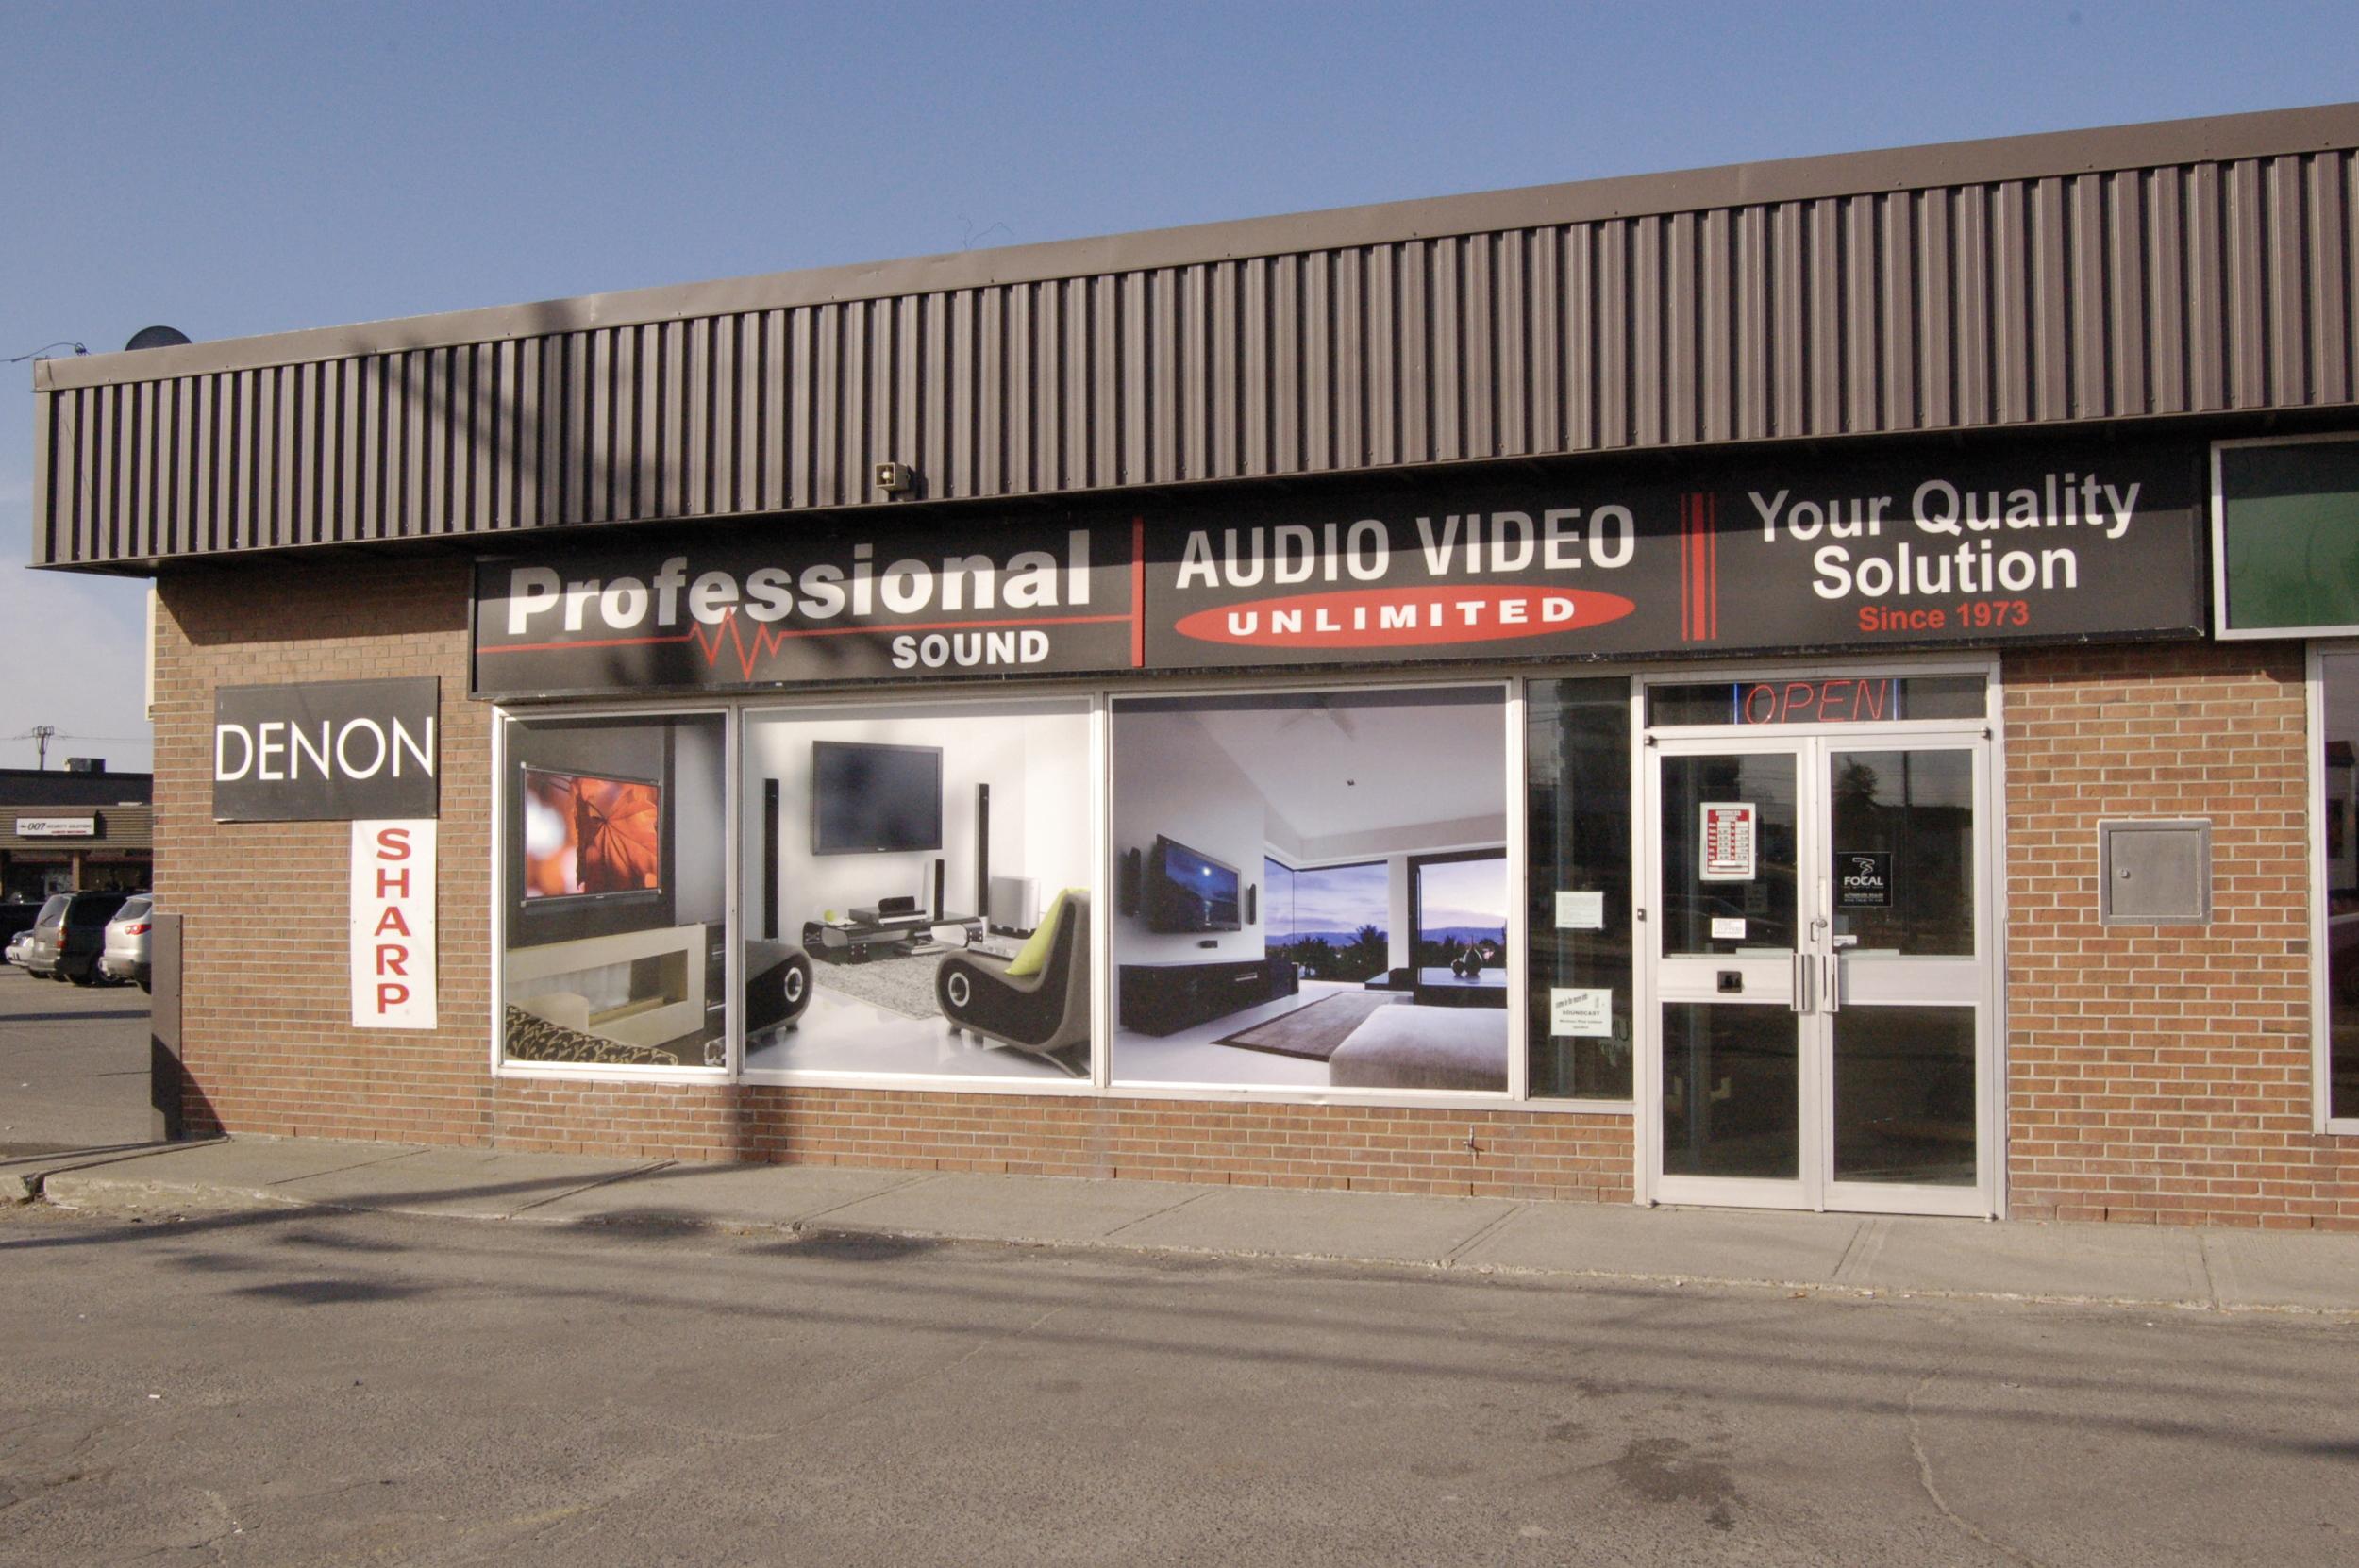 Store Front Pro Sound 001.JPG